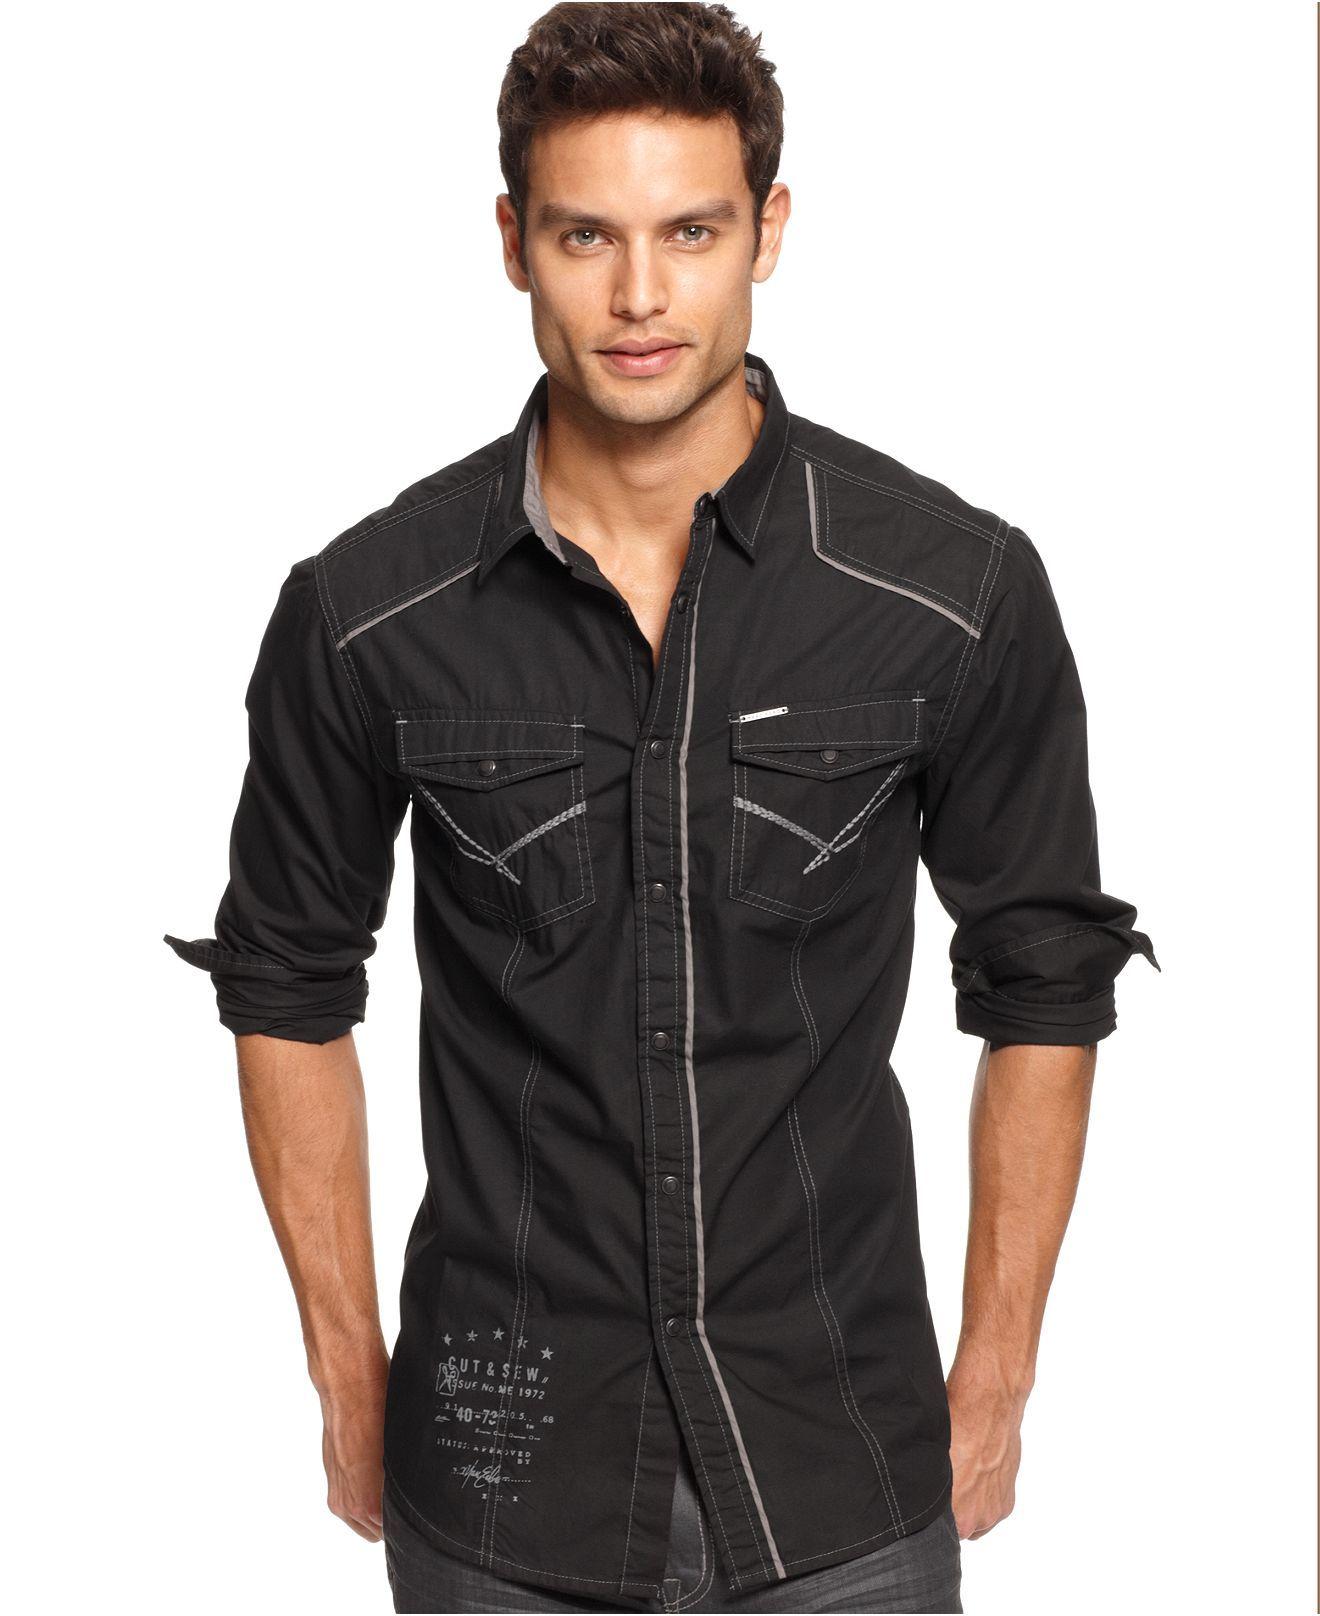 marc ecko cut amp sew shirts long sleeve button down